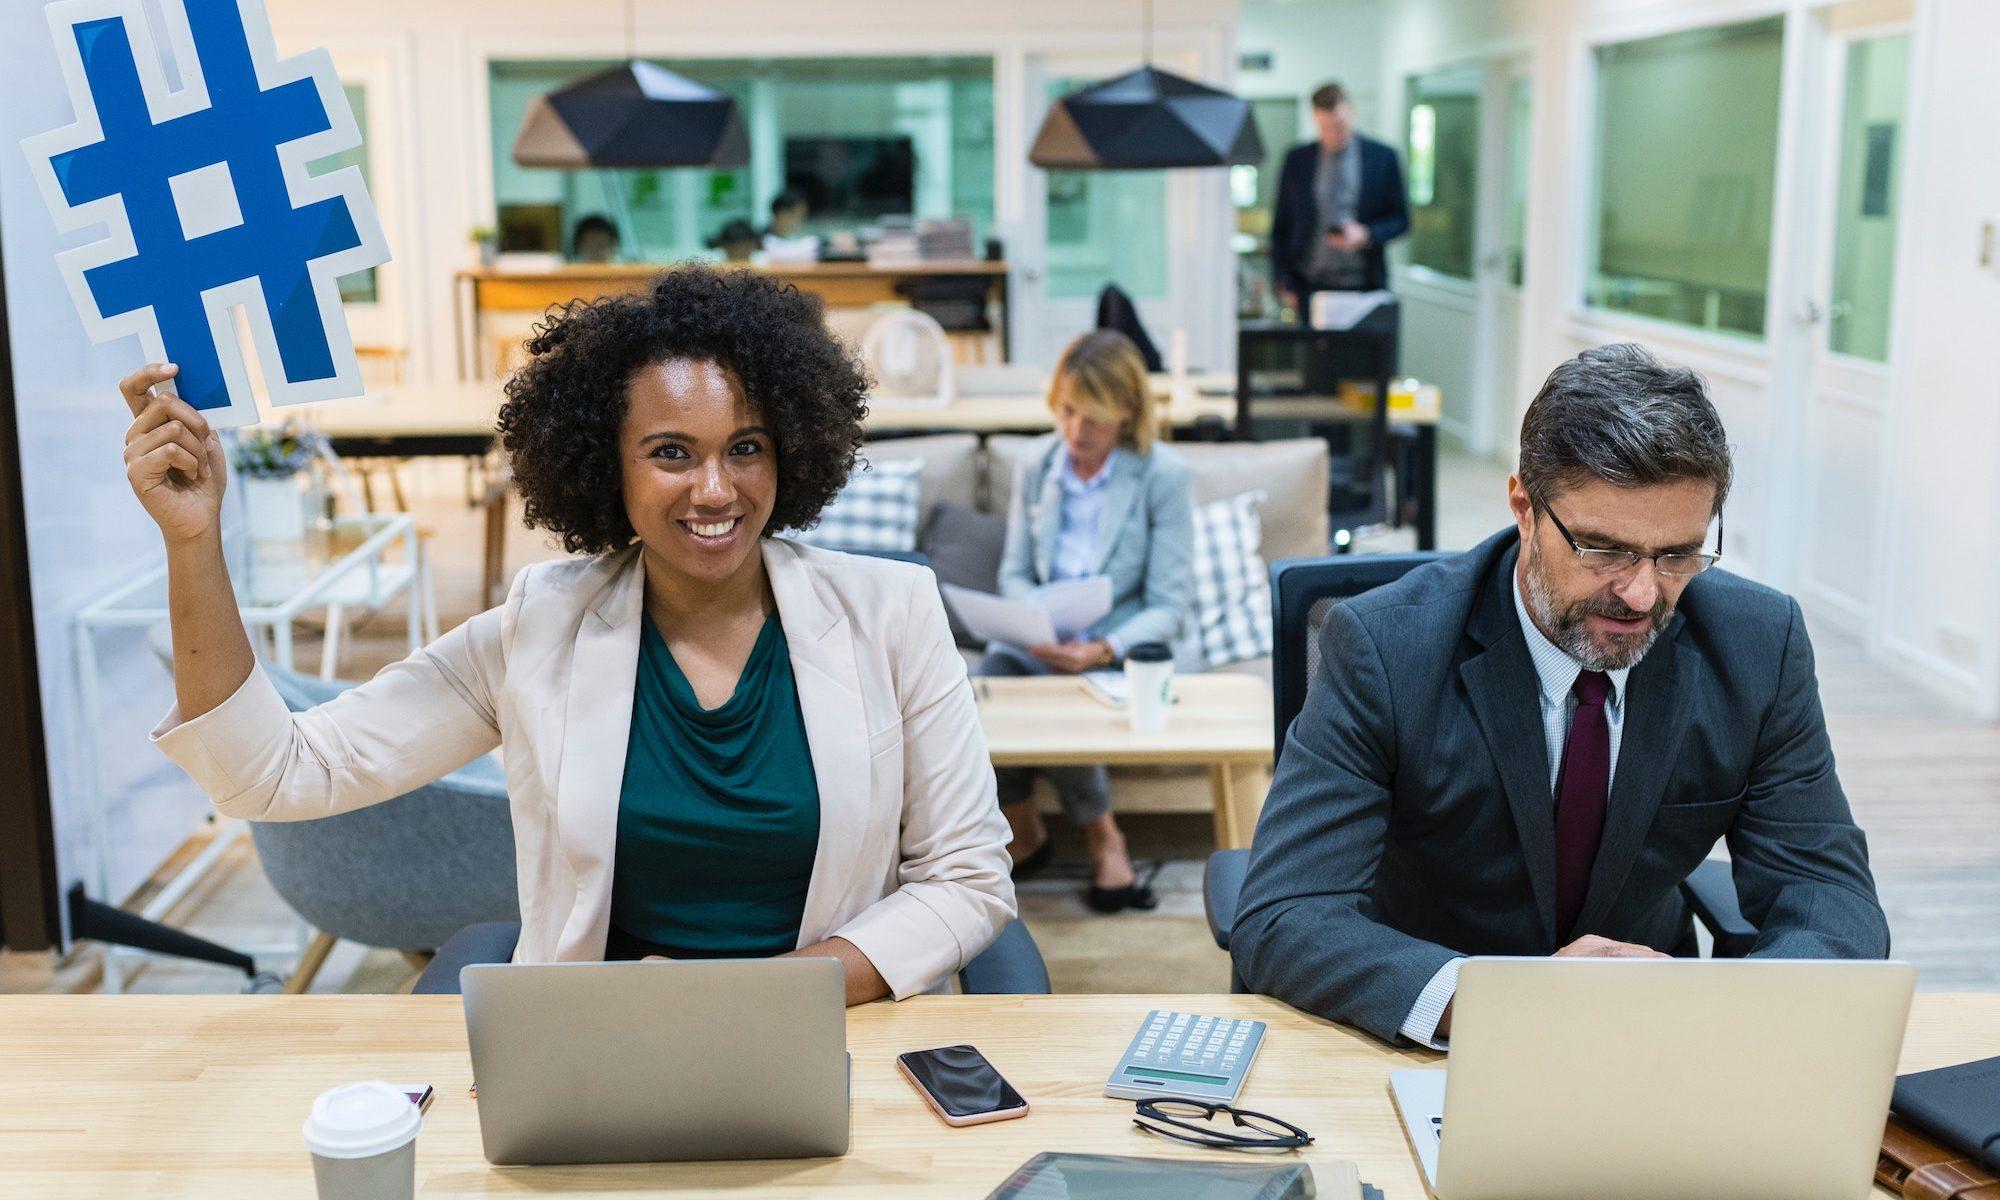 Employee Advocacy for Financial Services: Webinar Takeaways, Part 1